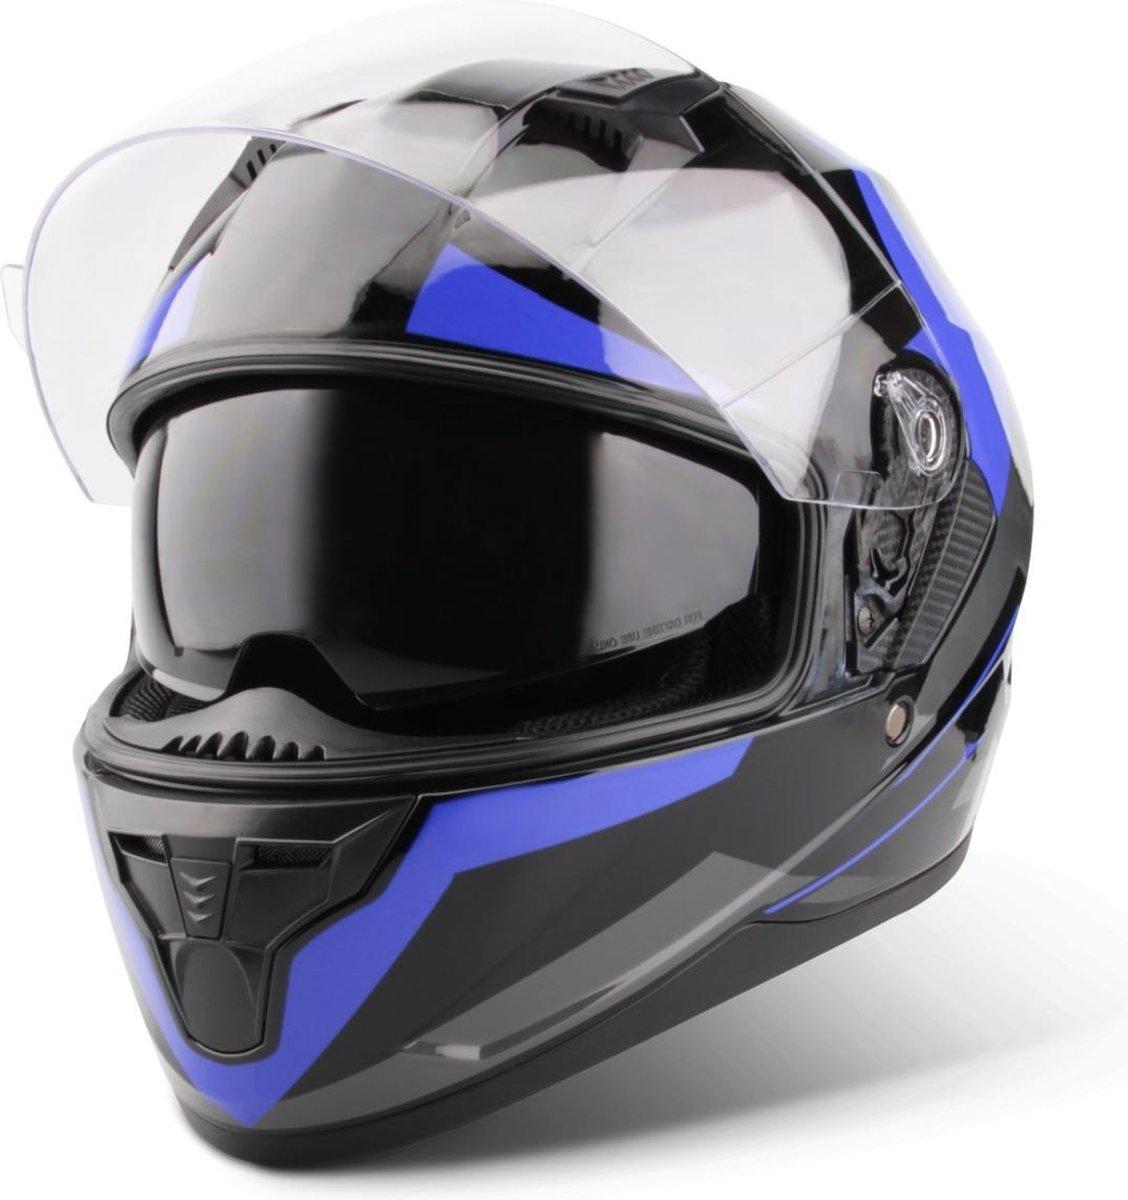 Vinz Becket Integraalhelm met Zonnevizier / Motorhelm / Scooter helm / Brommerhelm   Blauw